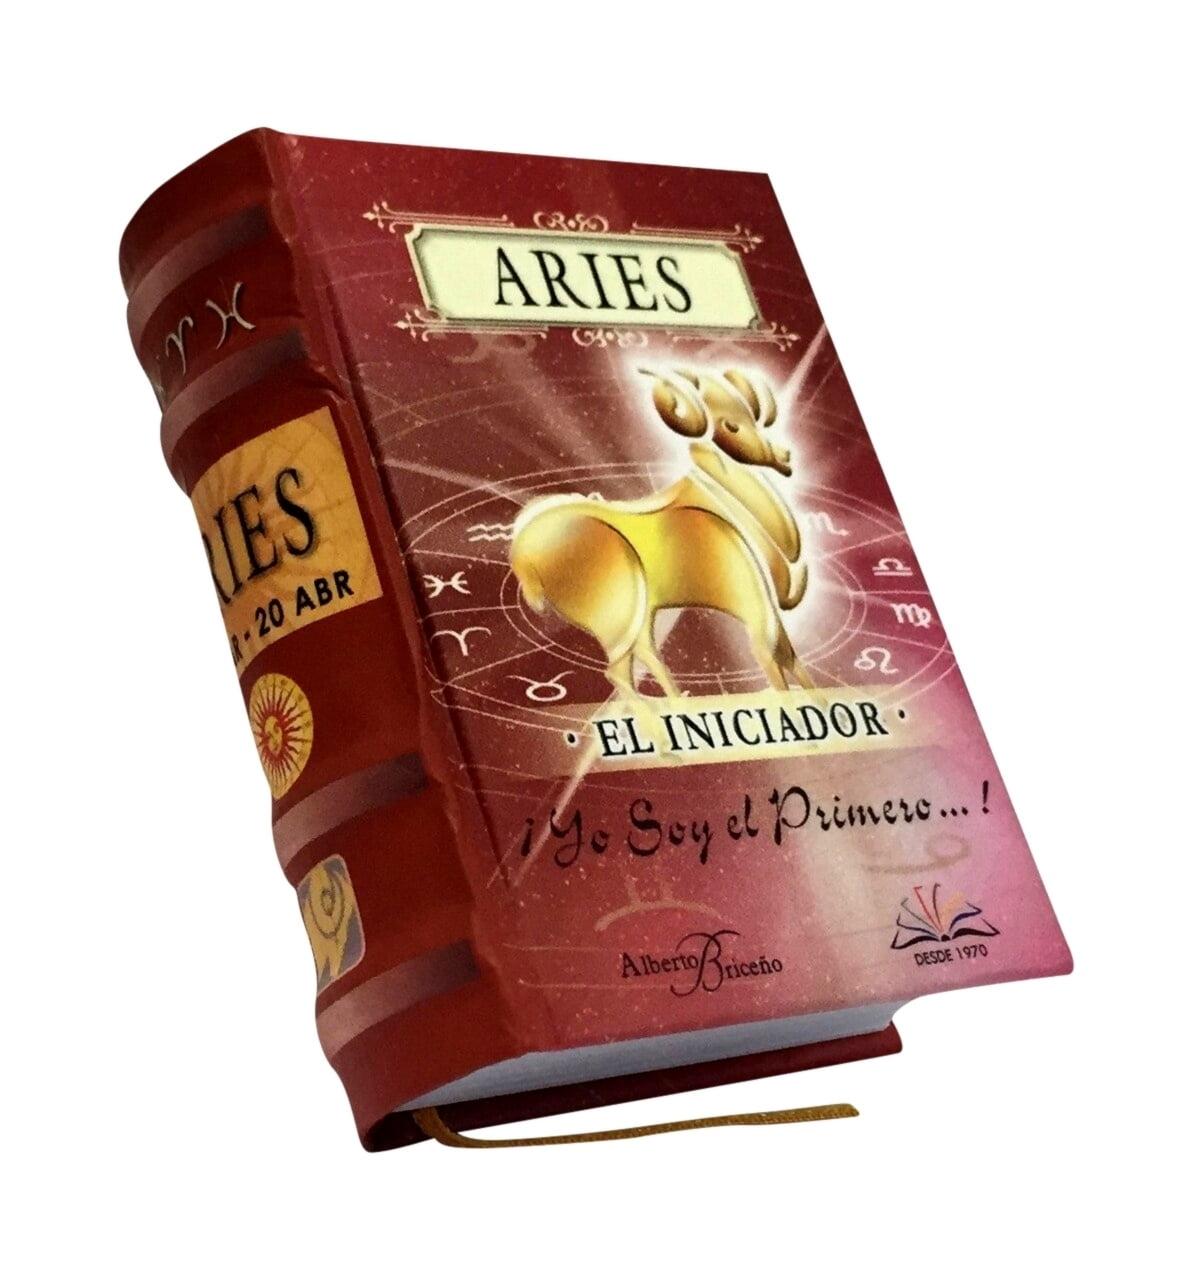 aries-miniature-book-libro